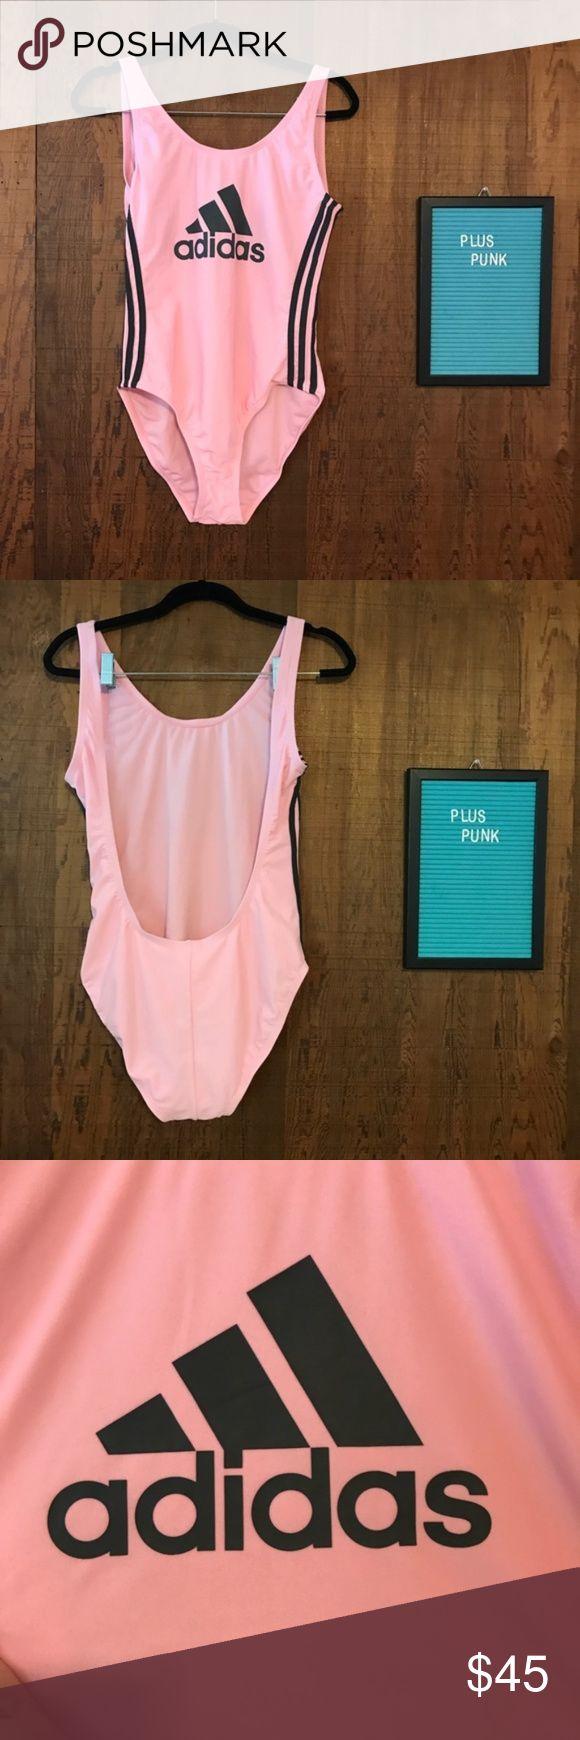 Adidas One Piece Swimsuit Pink & Gray Medium NWT This U-back one-piece swimsuit …